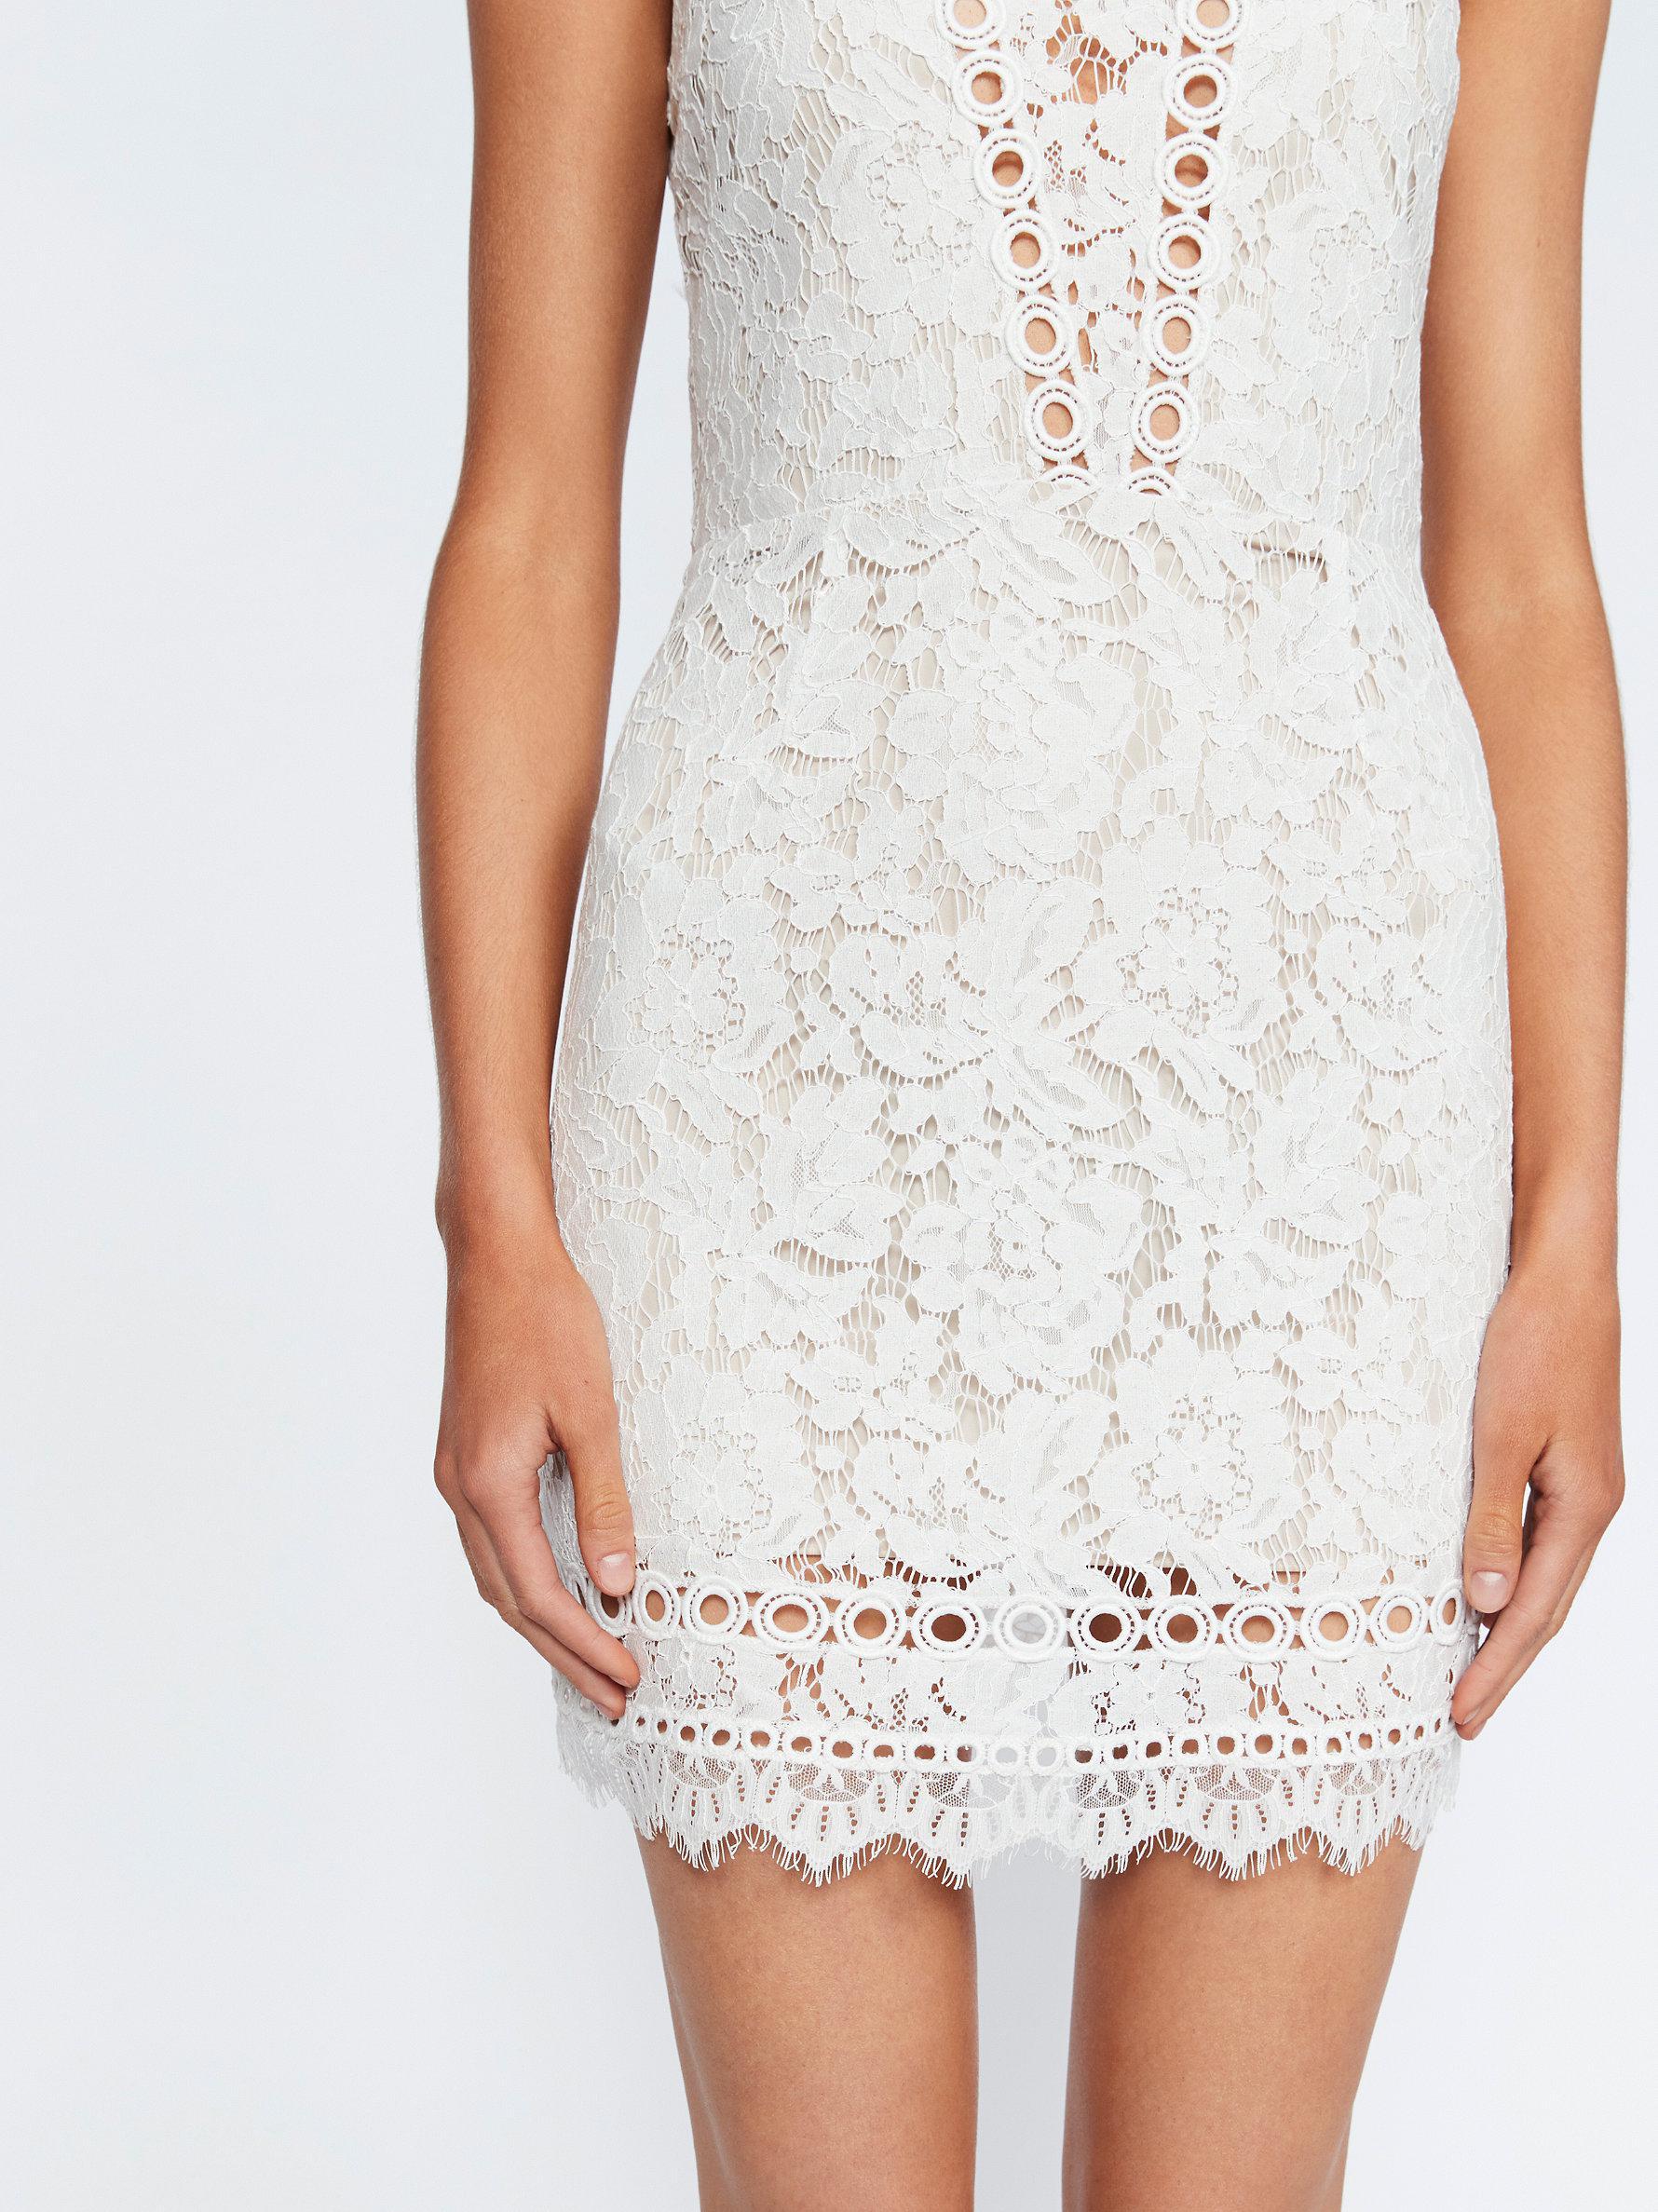 6fb334b7e1 Free People Cherie Bodycon Mini Dress in White - Lyst